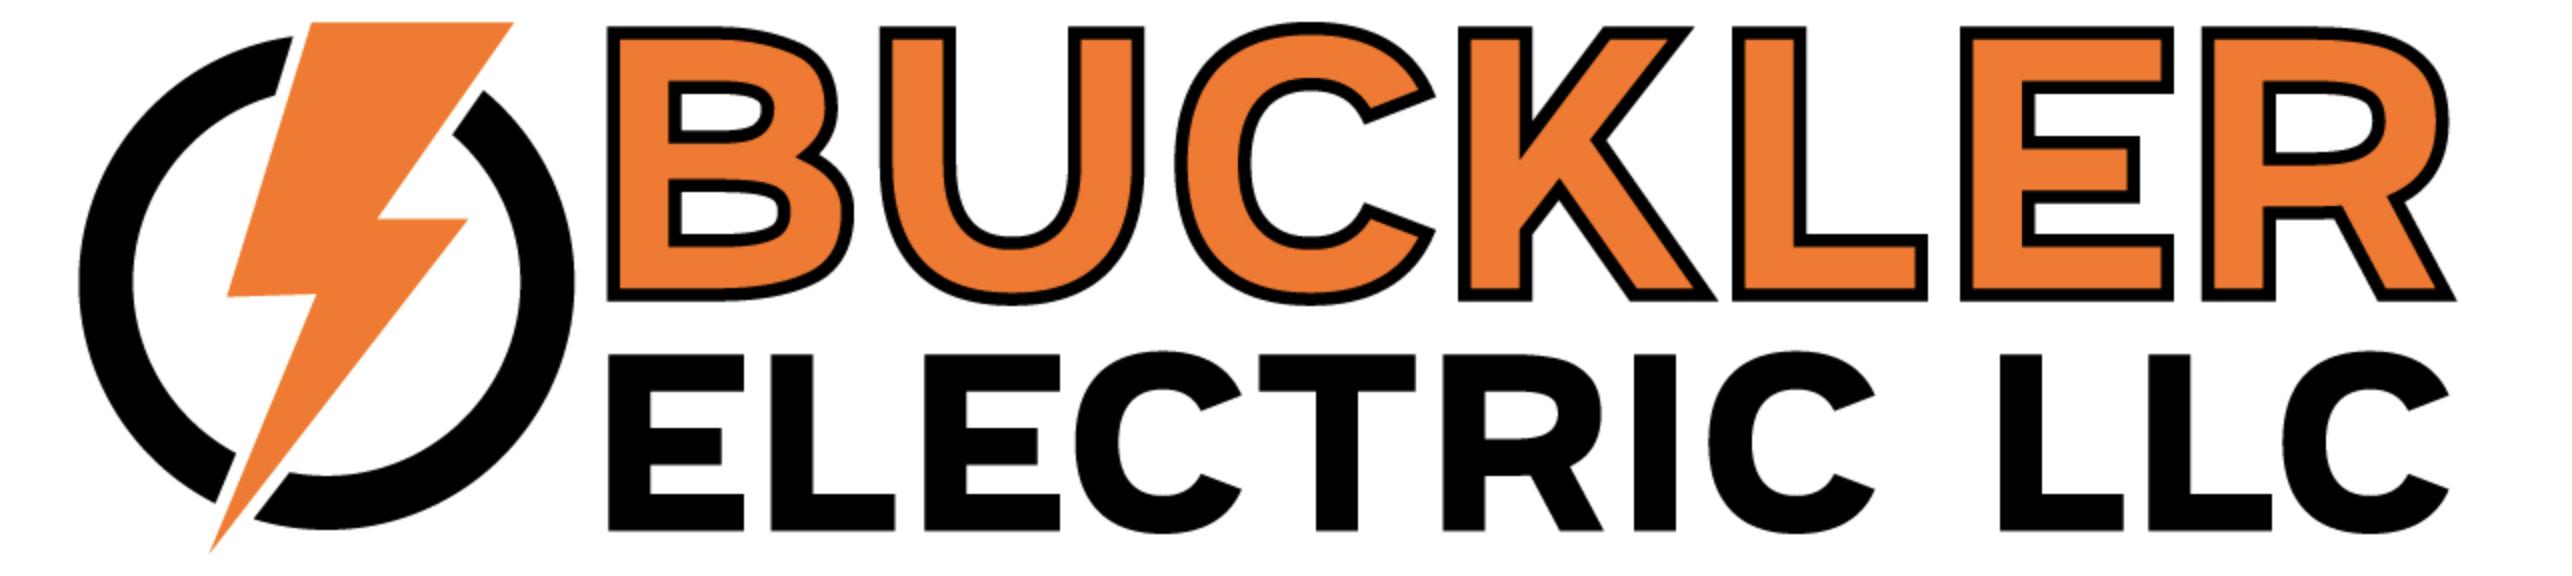 Buckler Electric Logo New